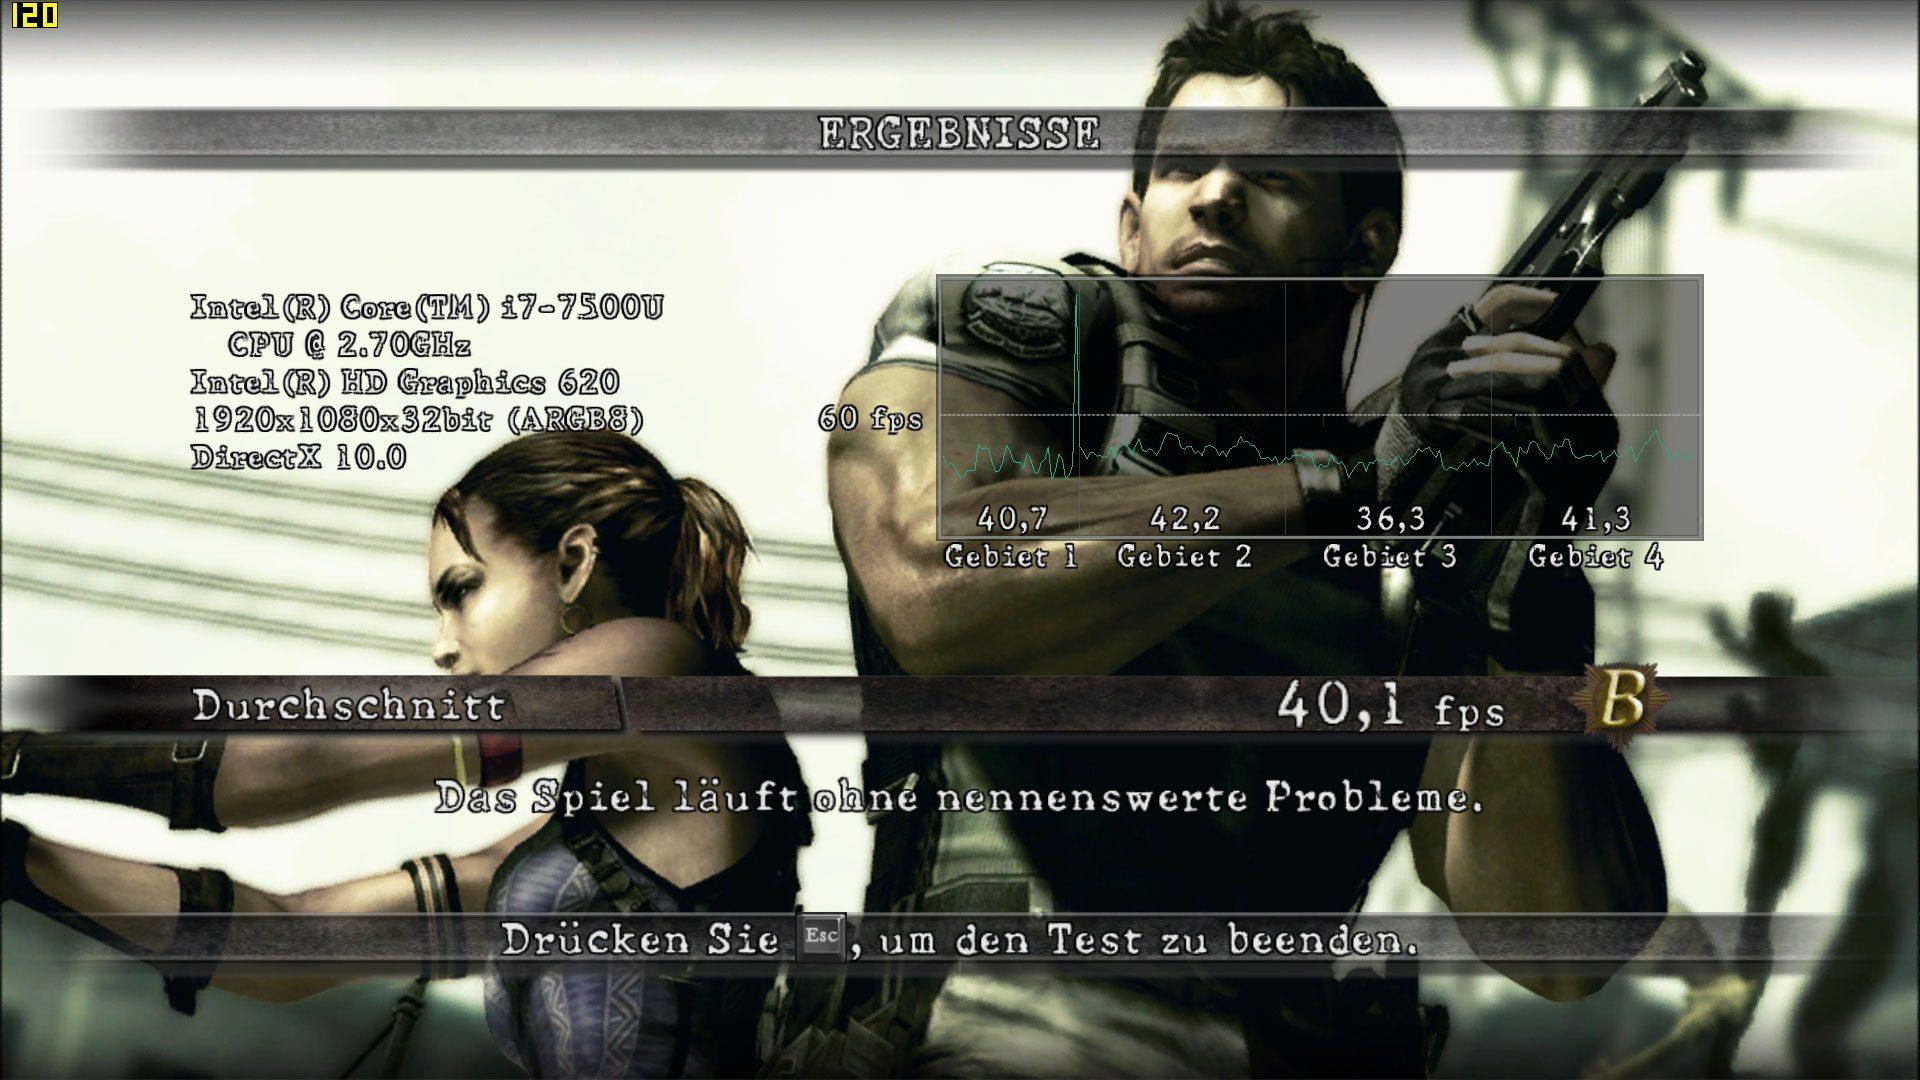 HP-Spectre-x360-13-ac002ng_Grafik-8